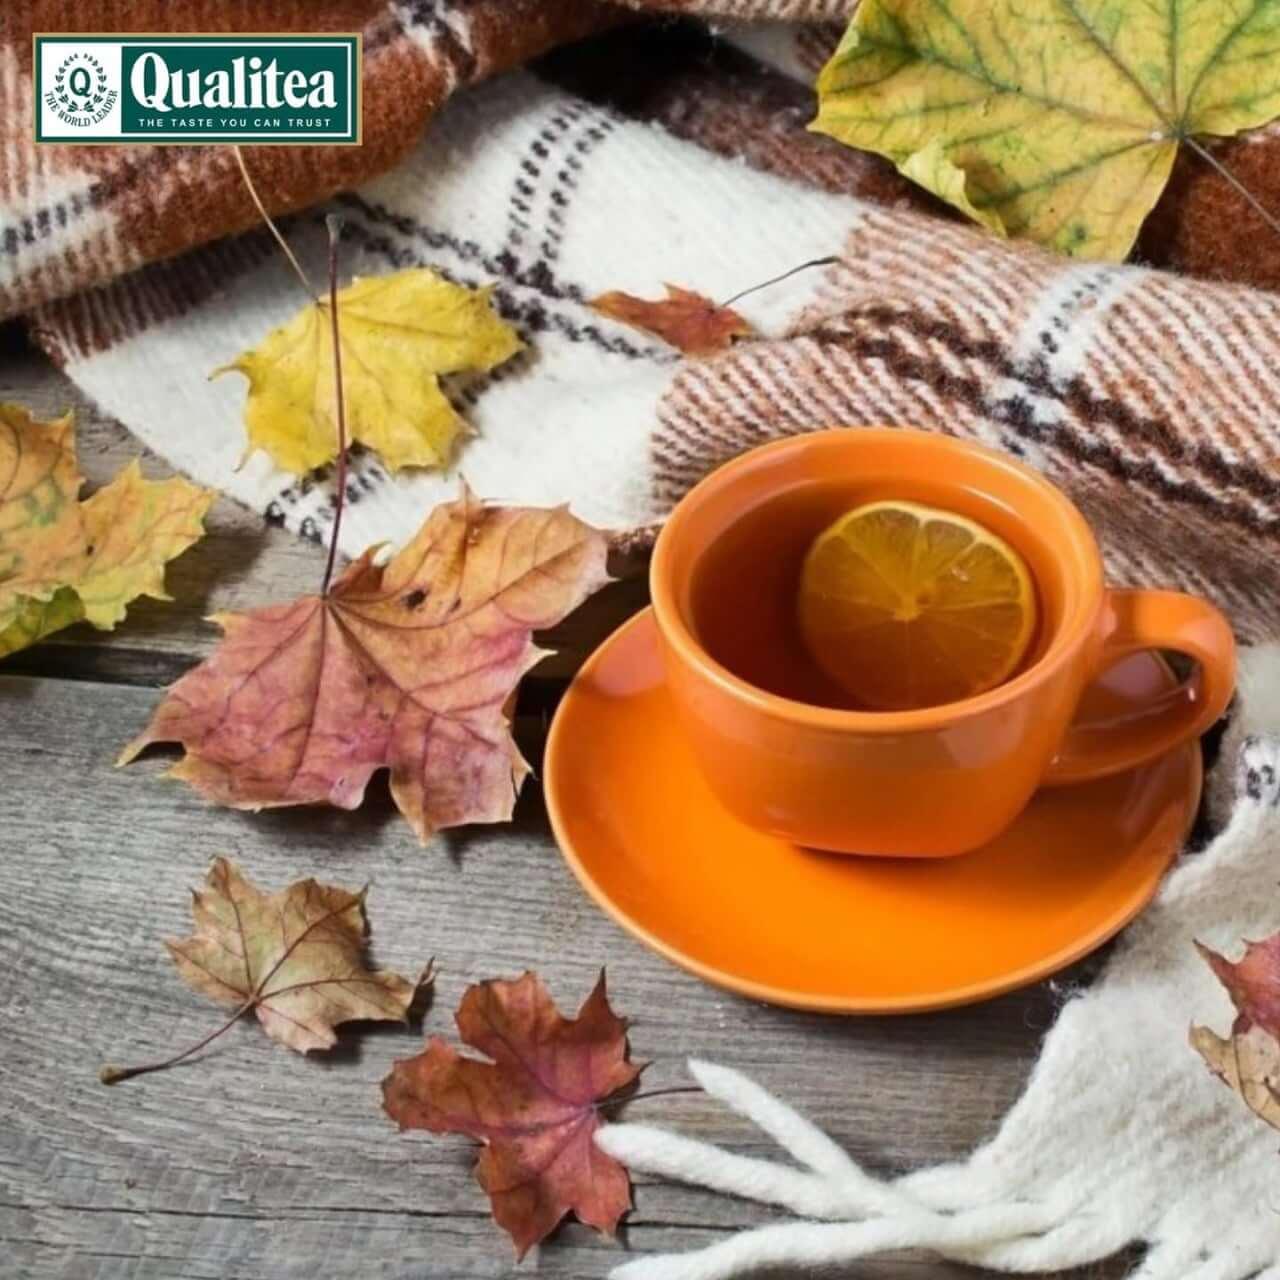 Qualitea чай - банер 2